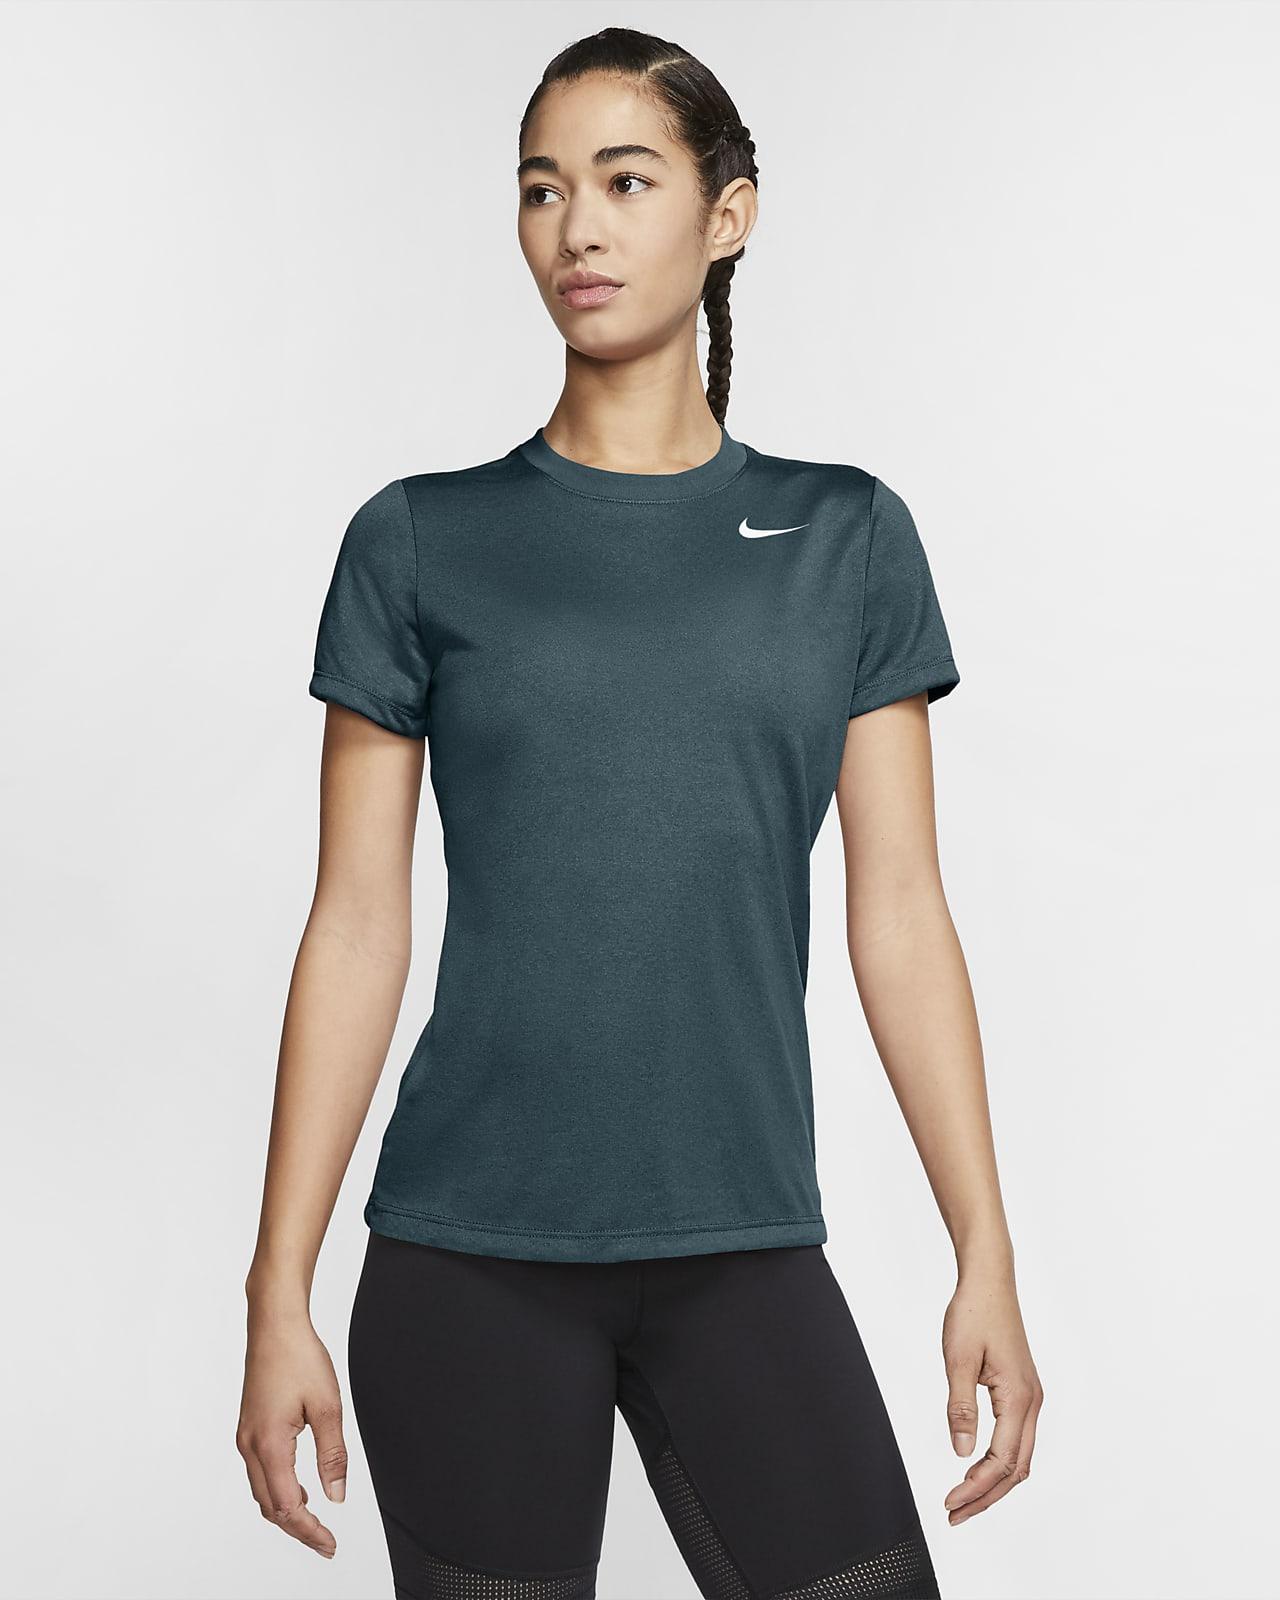 Nike Dri-FIT Legend Women's Training T-Shirt